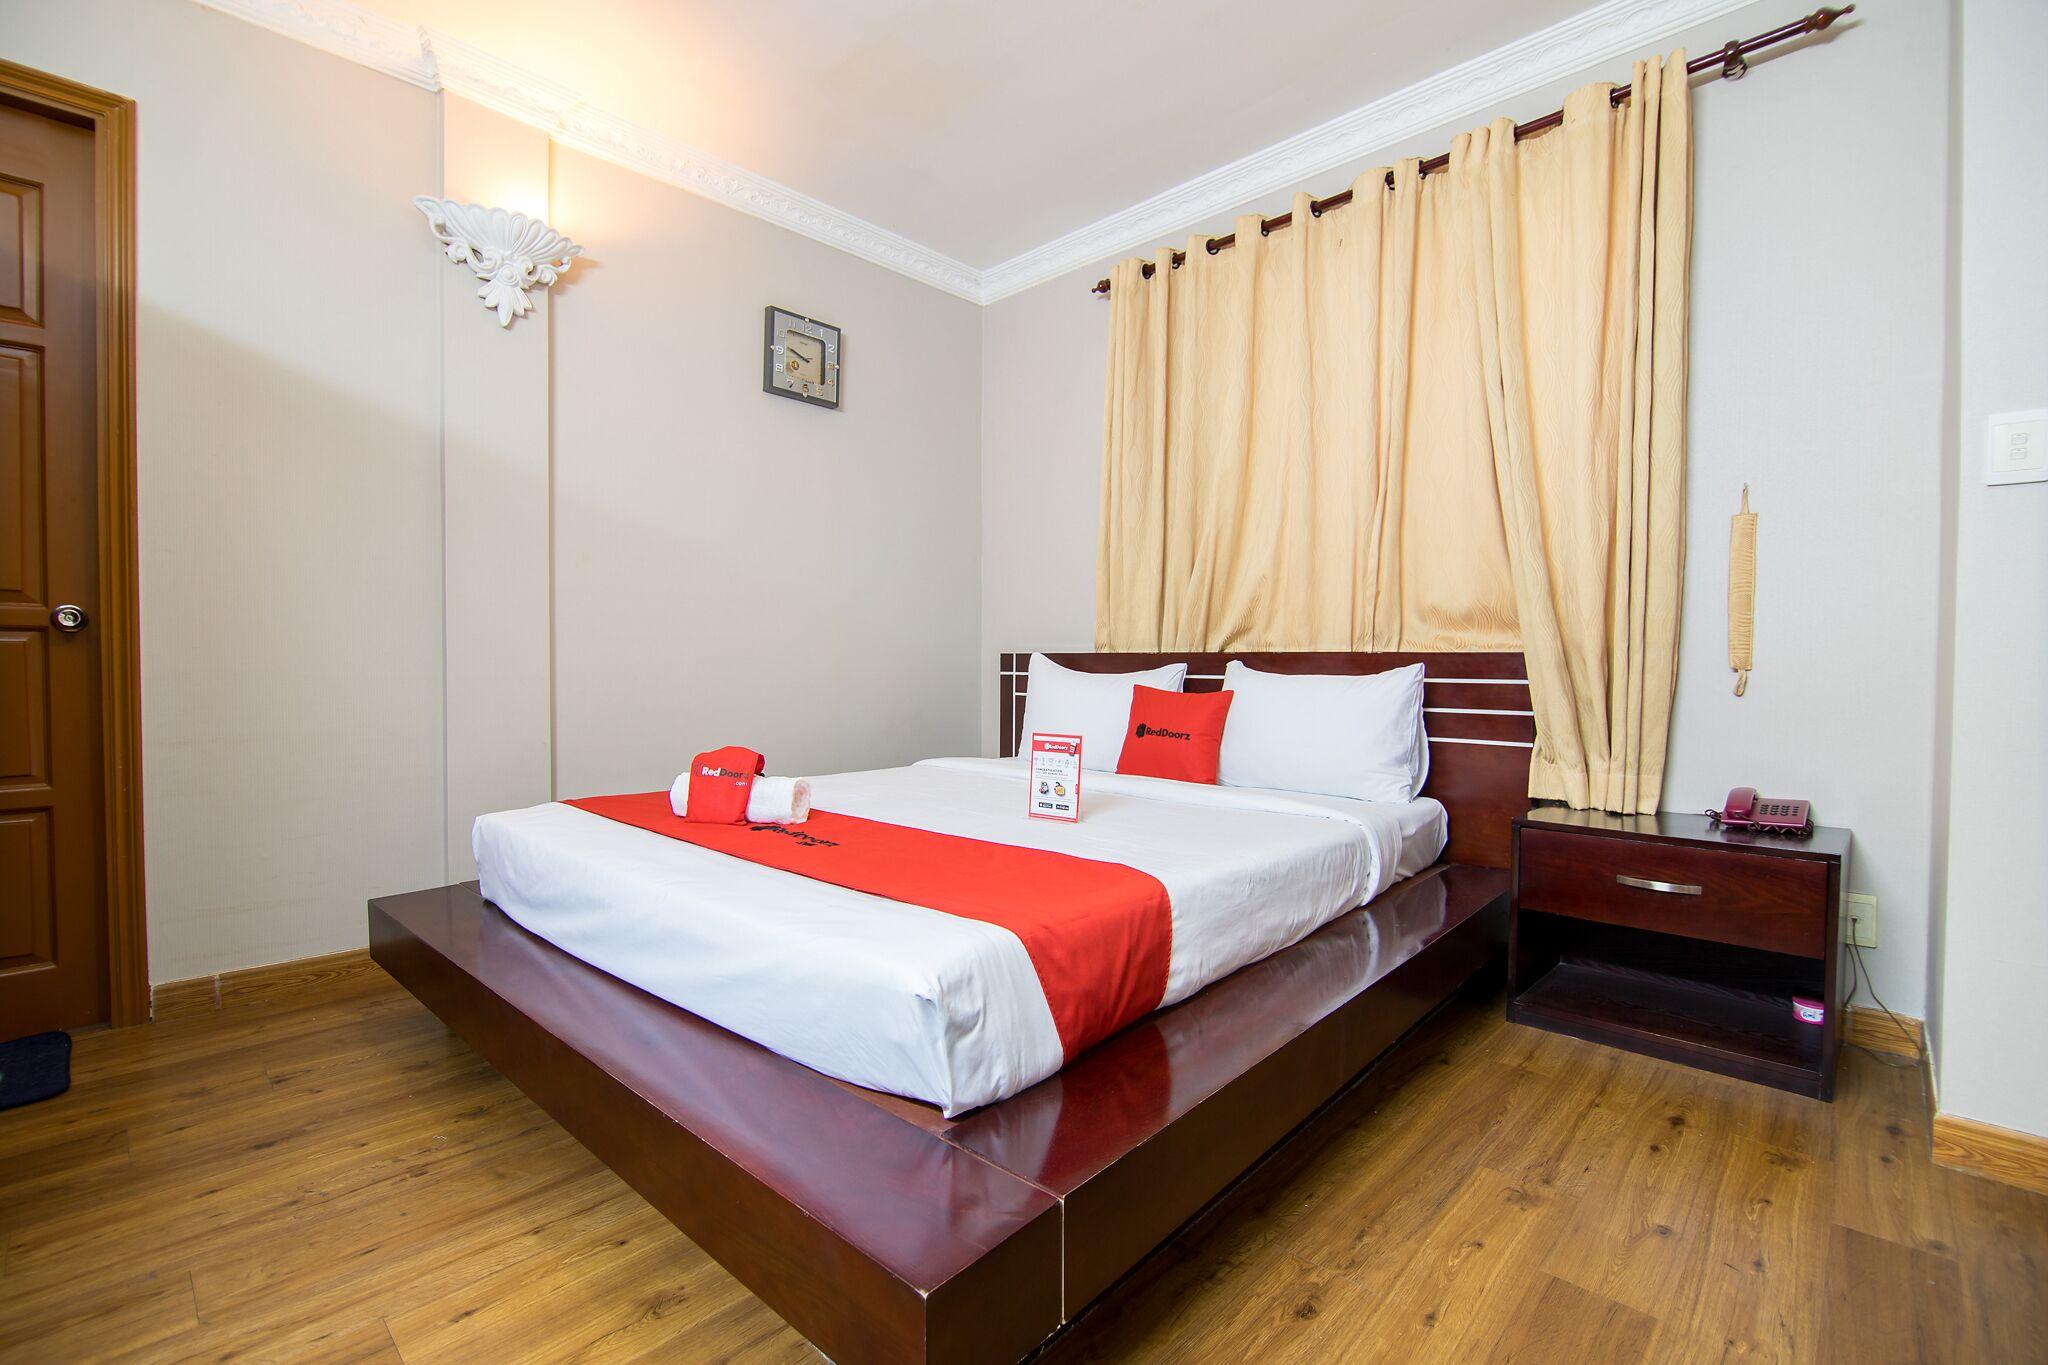 Quynh Giang Hotel Tan Binh Dist